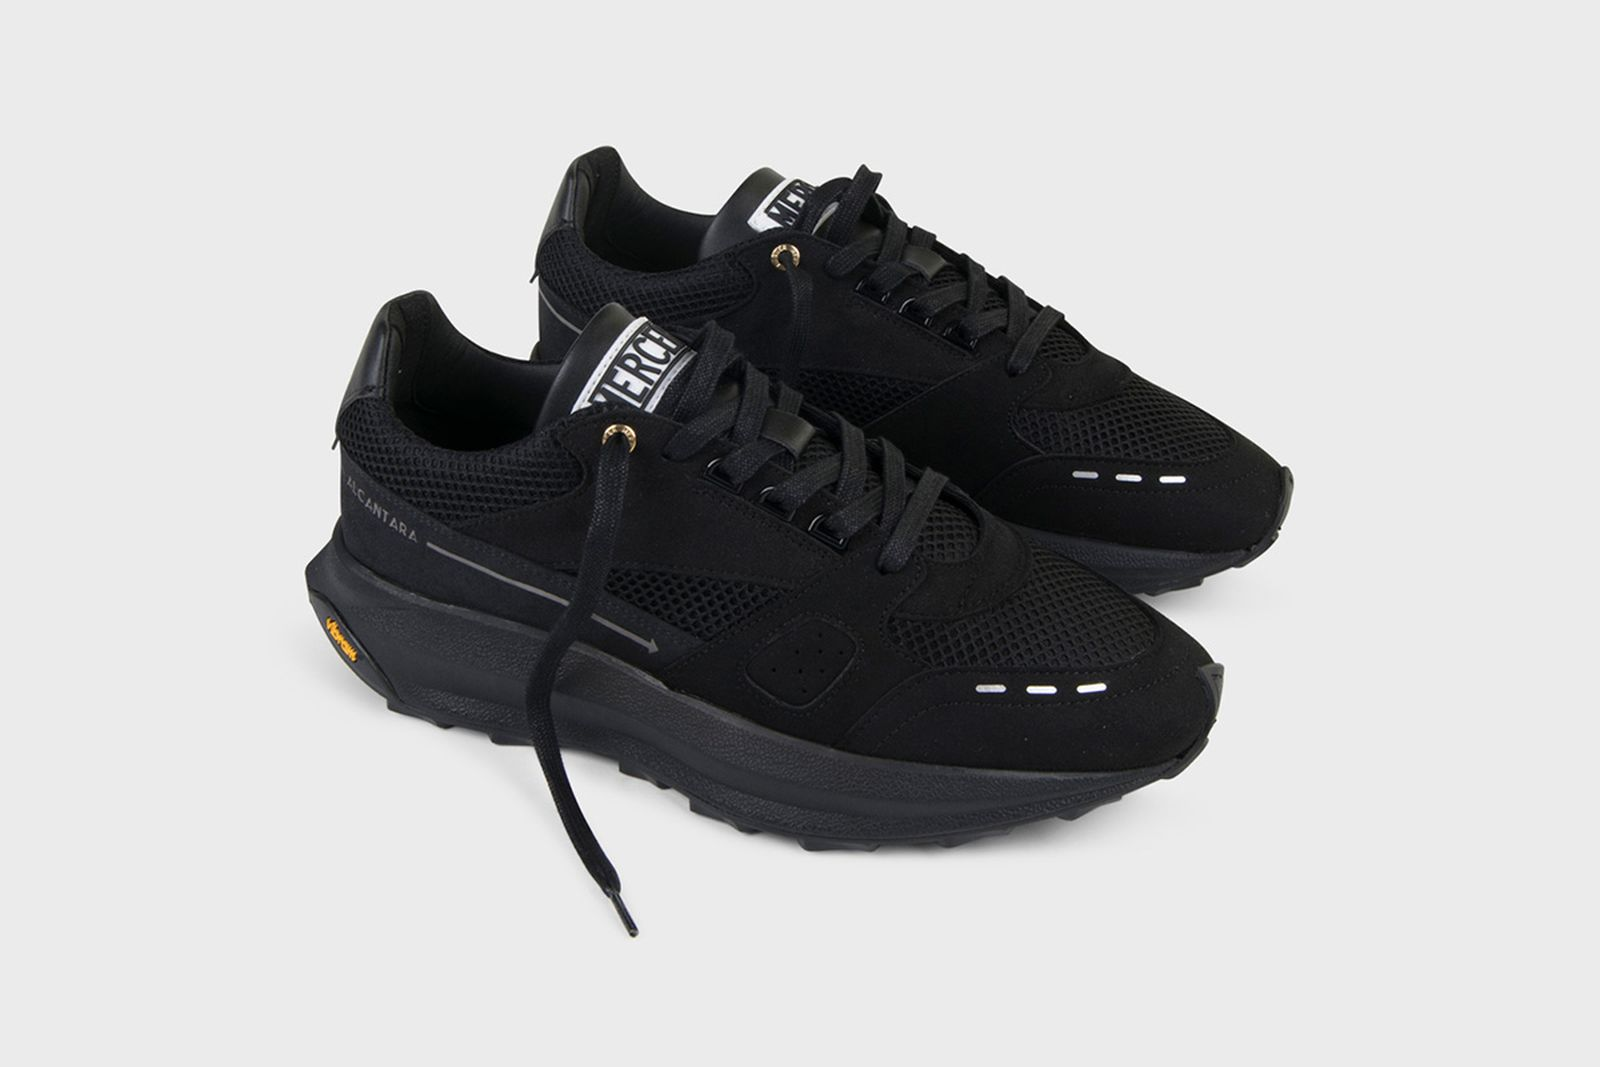 mercer-alcantara-sneaker-release-date-price-04